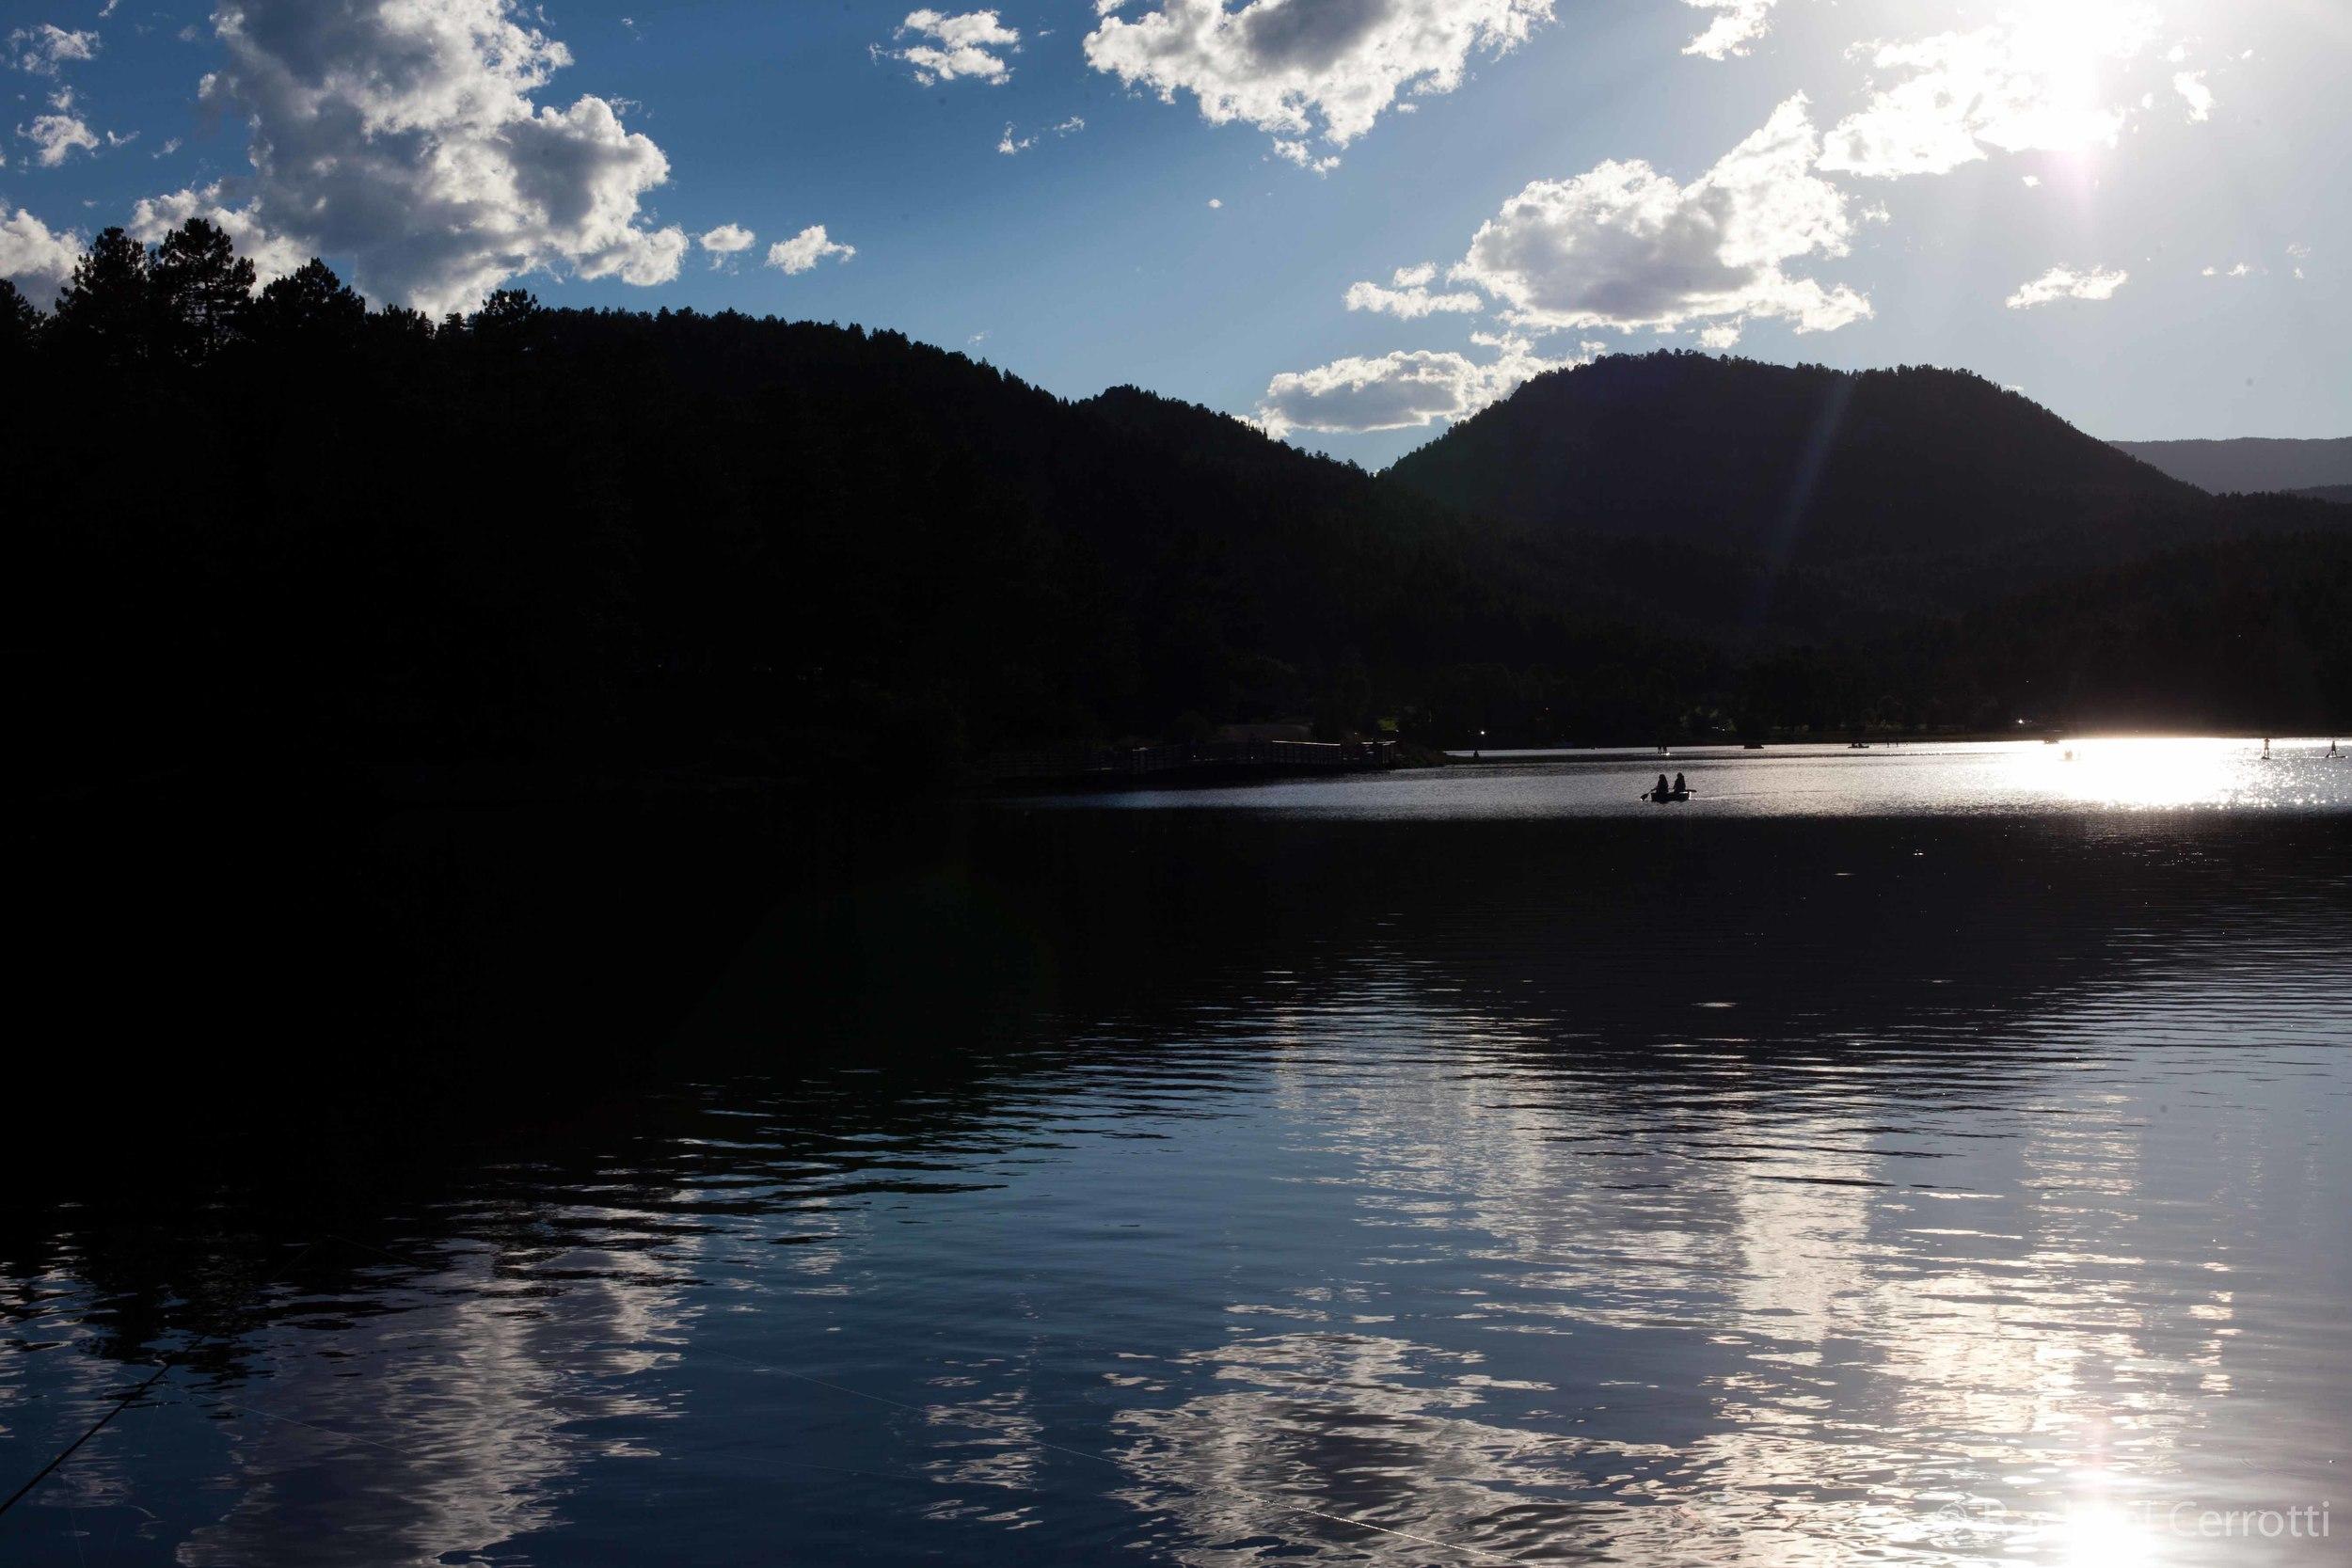 The Evergreen Reservoir in the evening light.